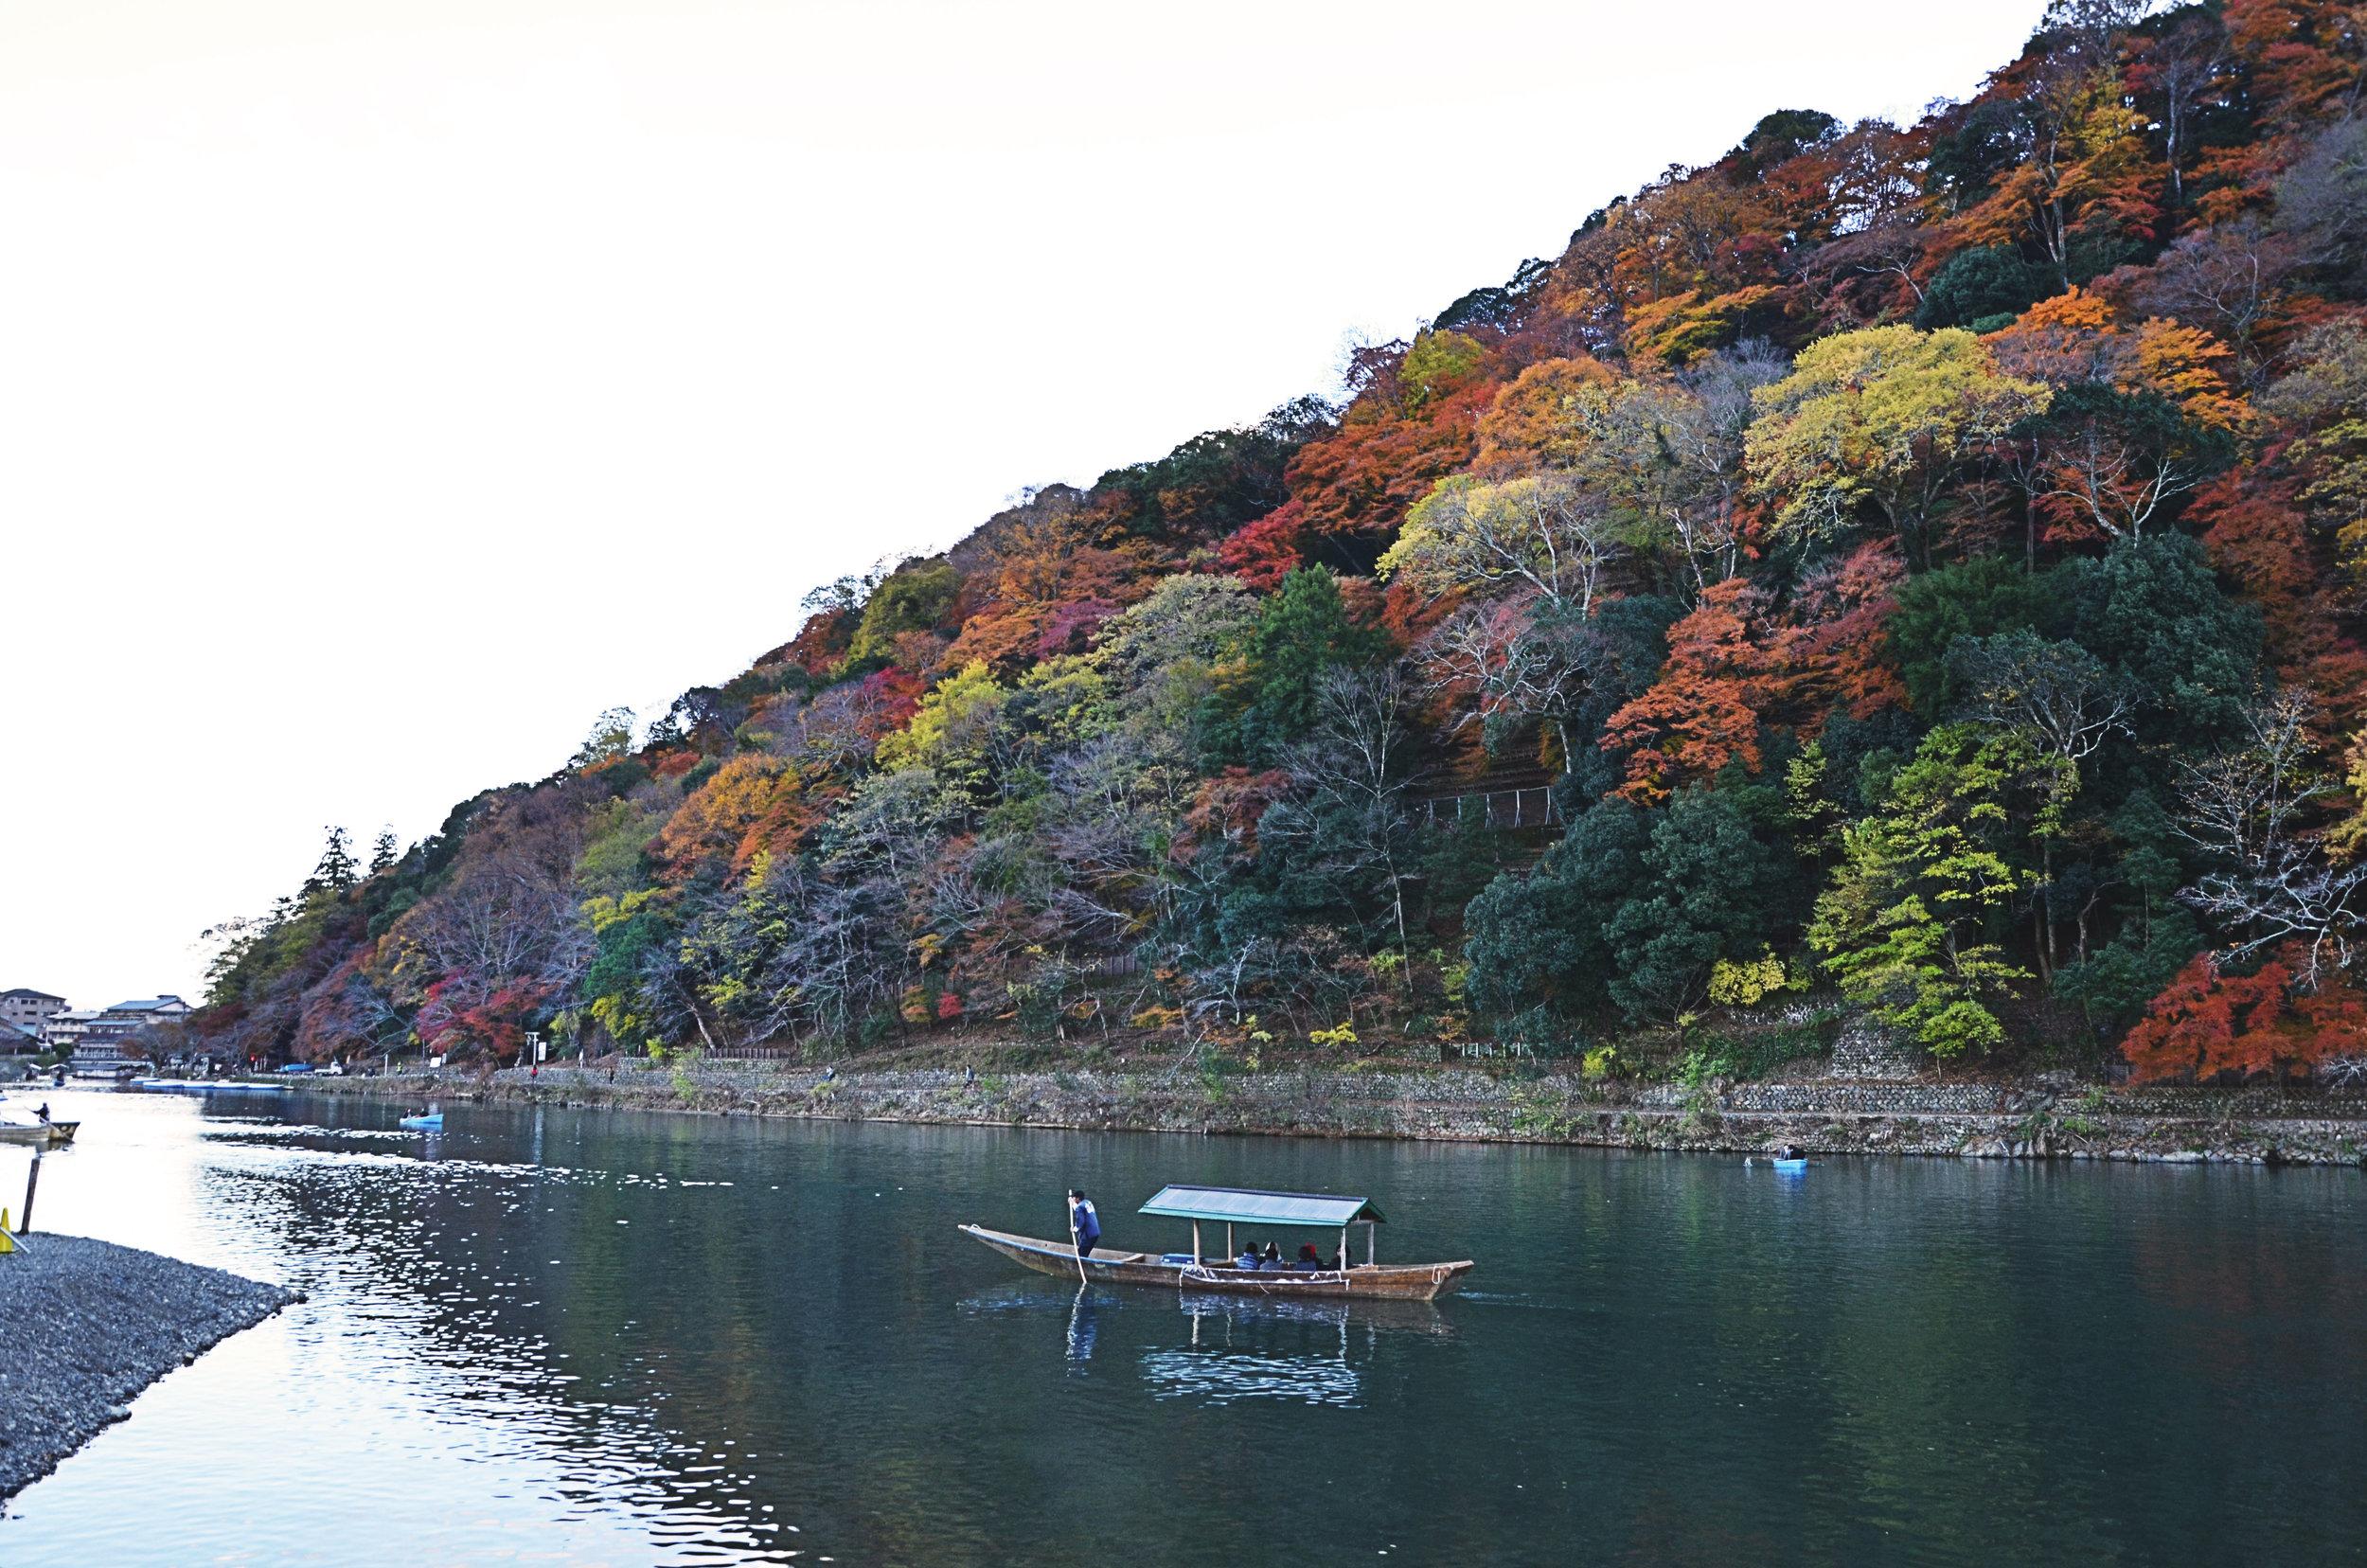 Boat captains on the Hozugawa-kudari boat ride to Arashiyama, Kyoto